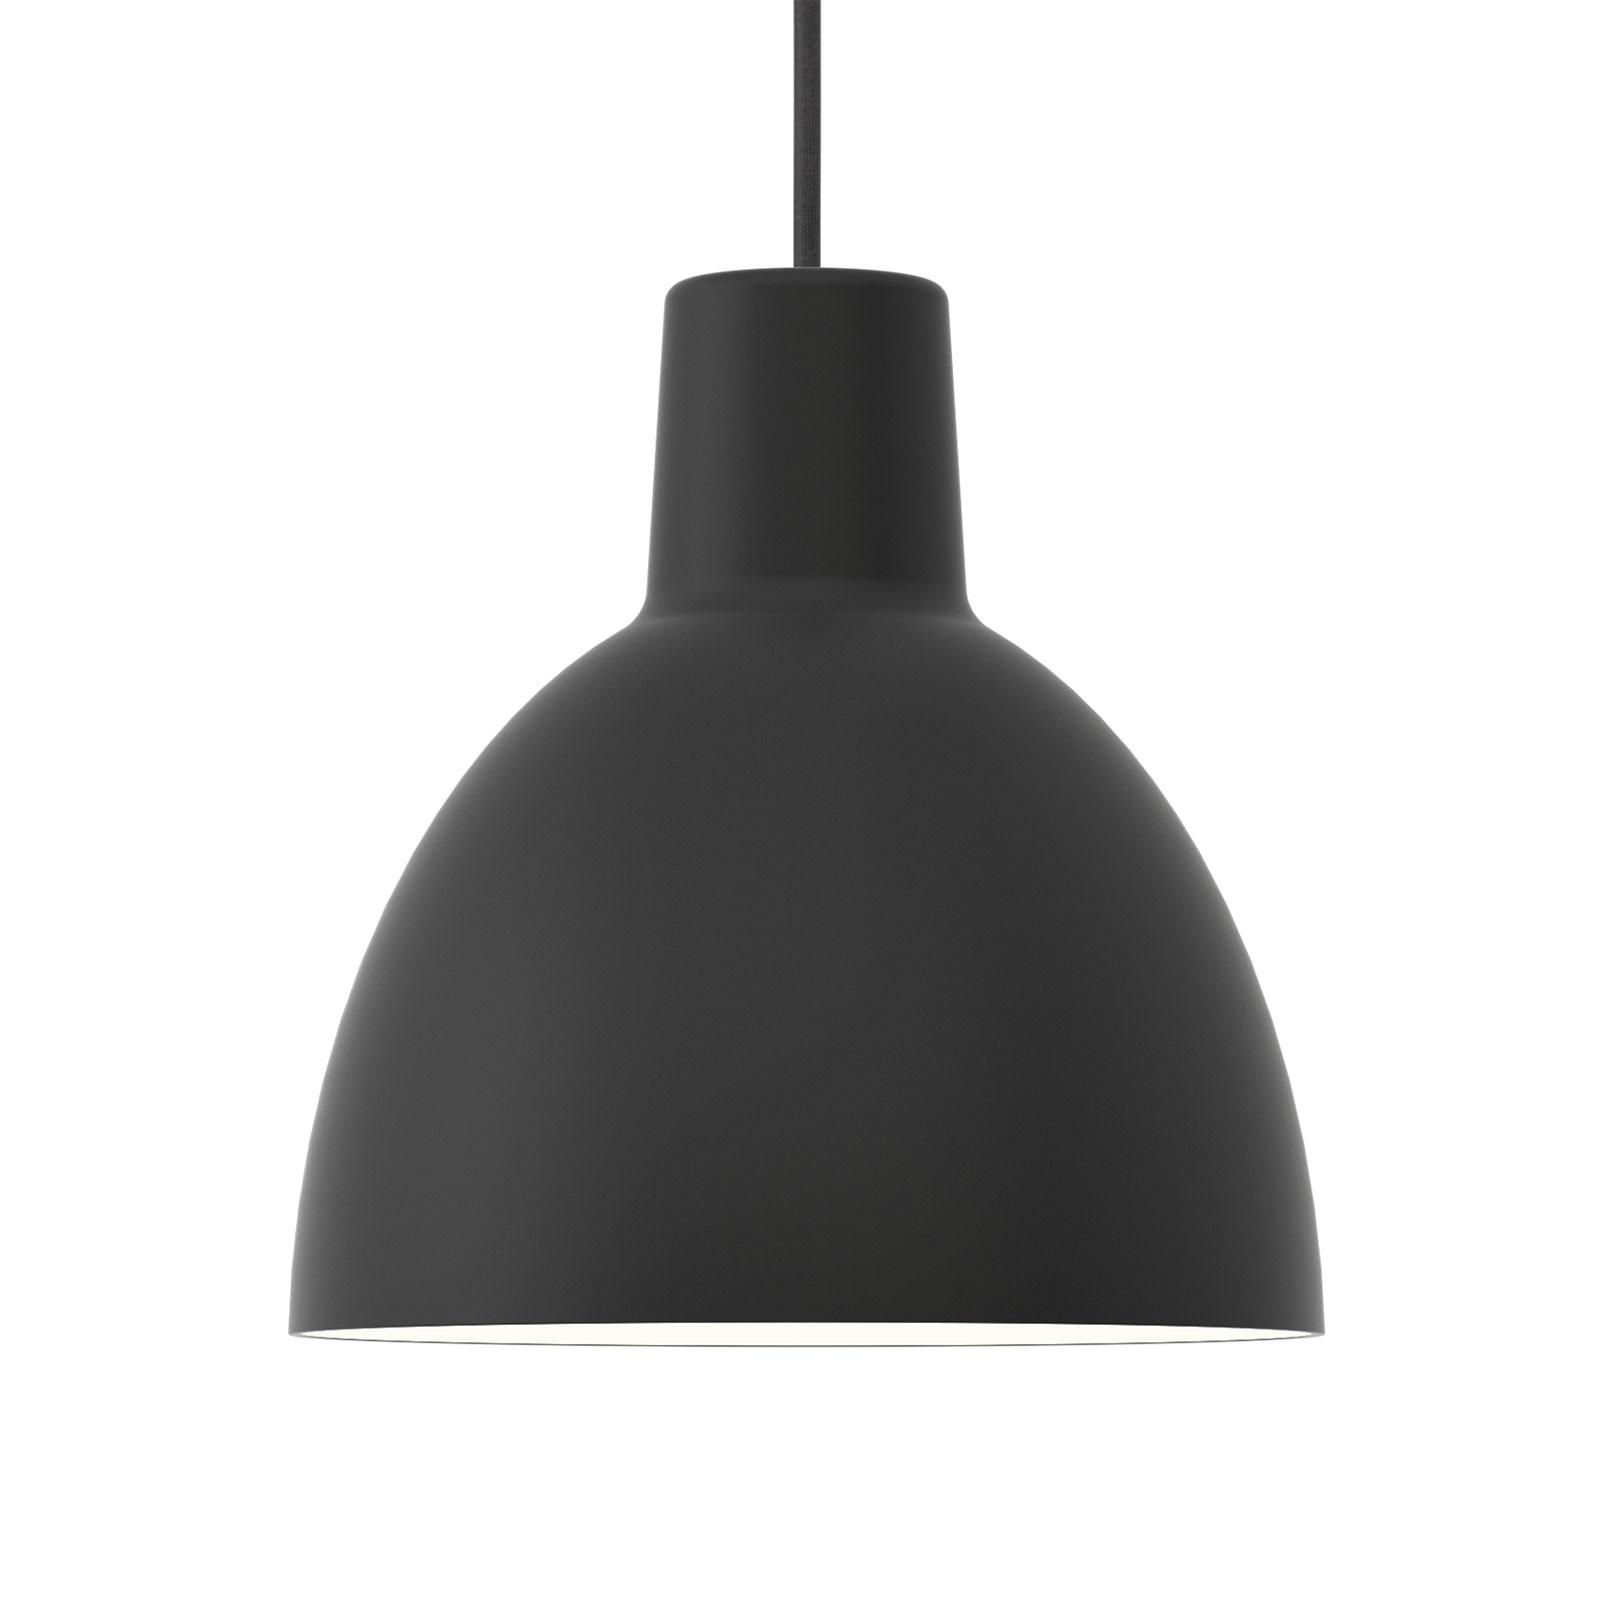 Louis Poulsen hanglamp Toldbod 250 zwart